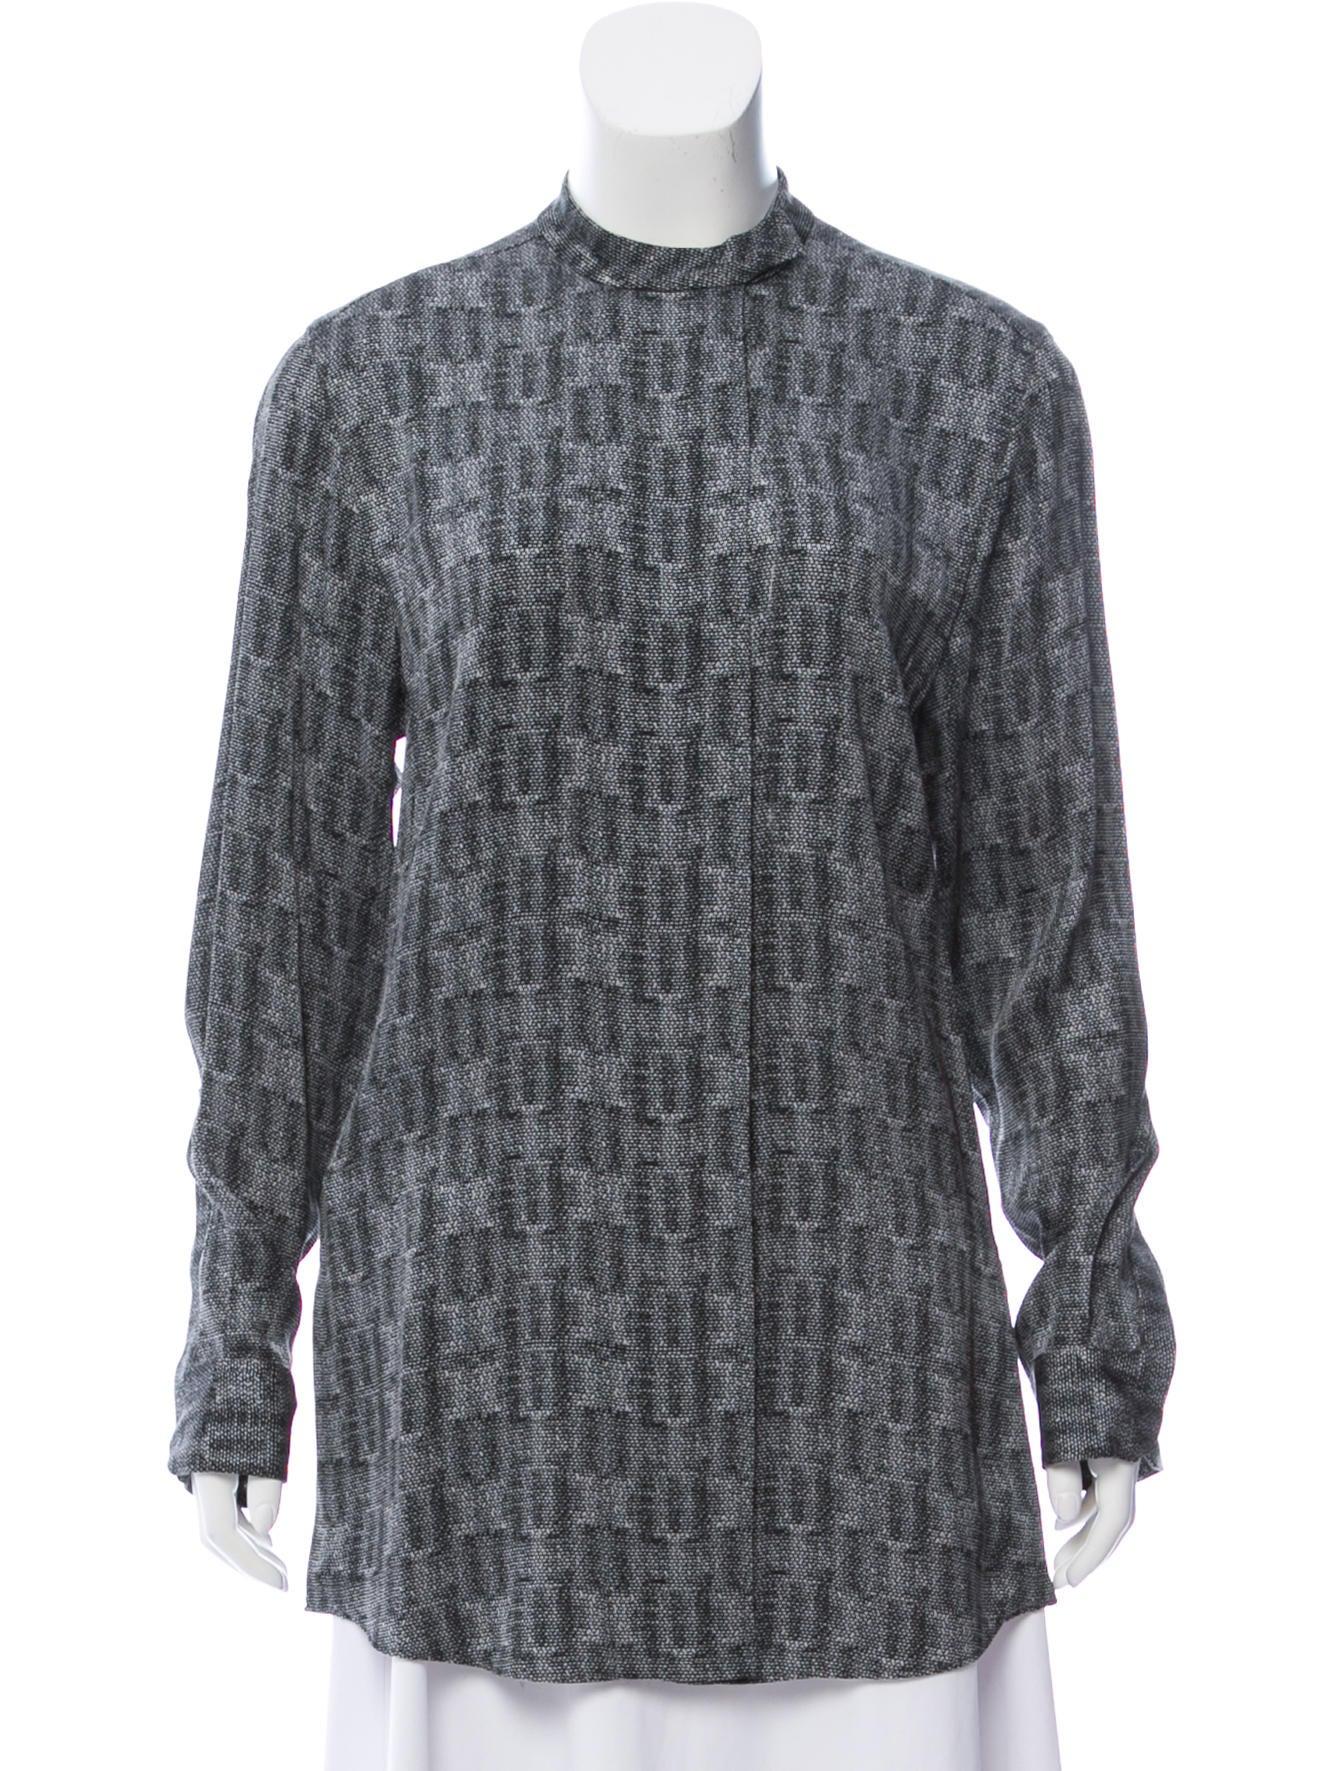 191f87d032c4 Calvin Klein Collection Animal Print Silk Blouse - Clothing ...